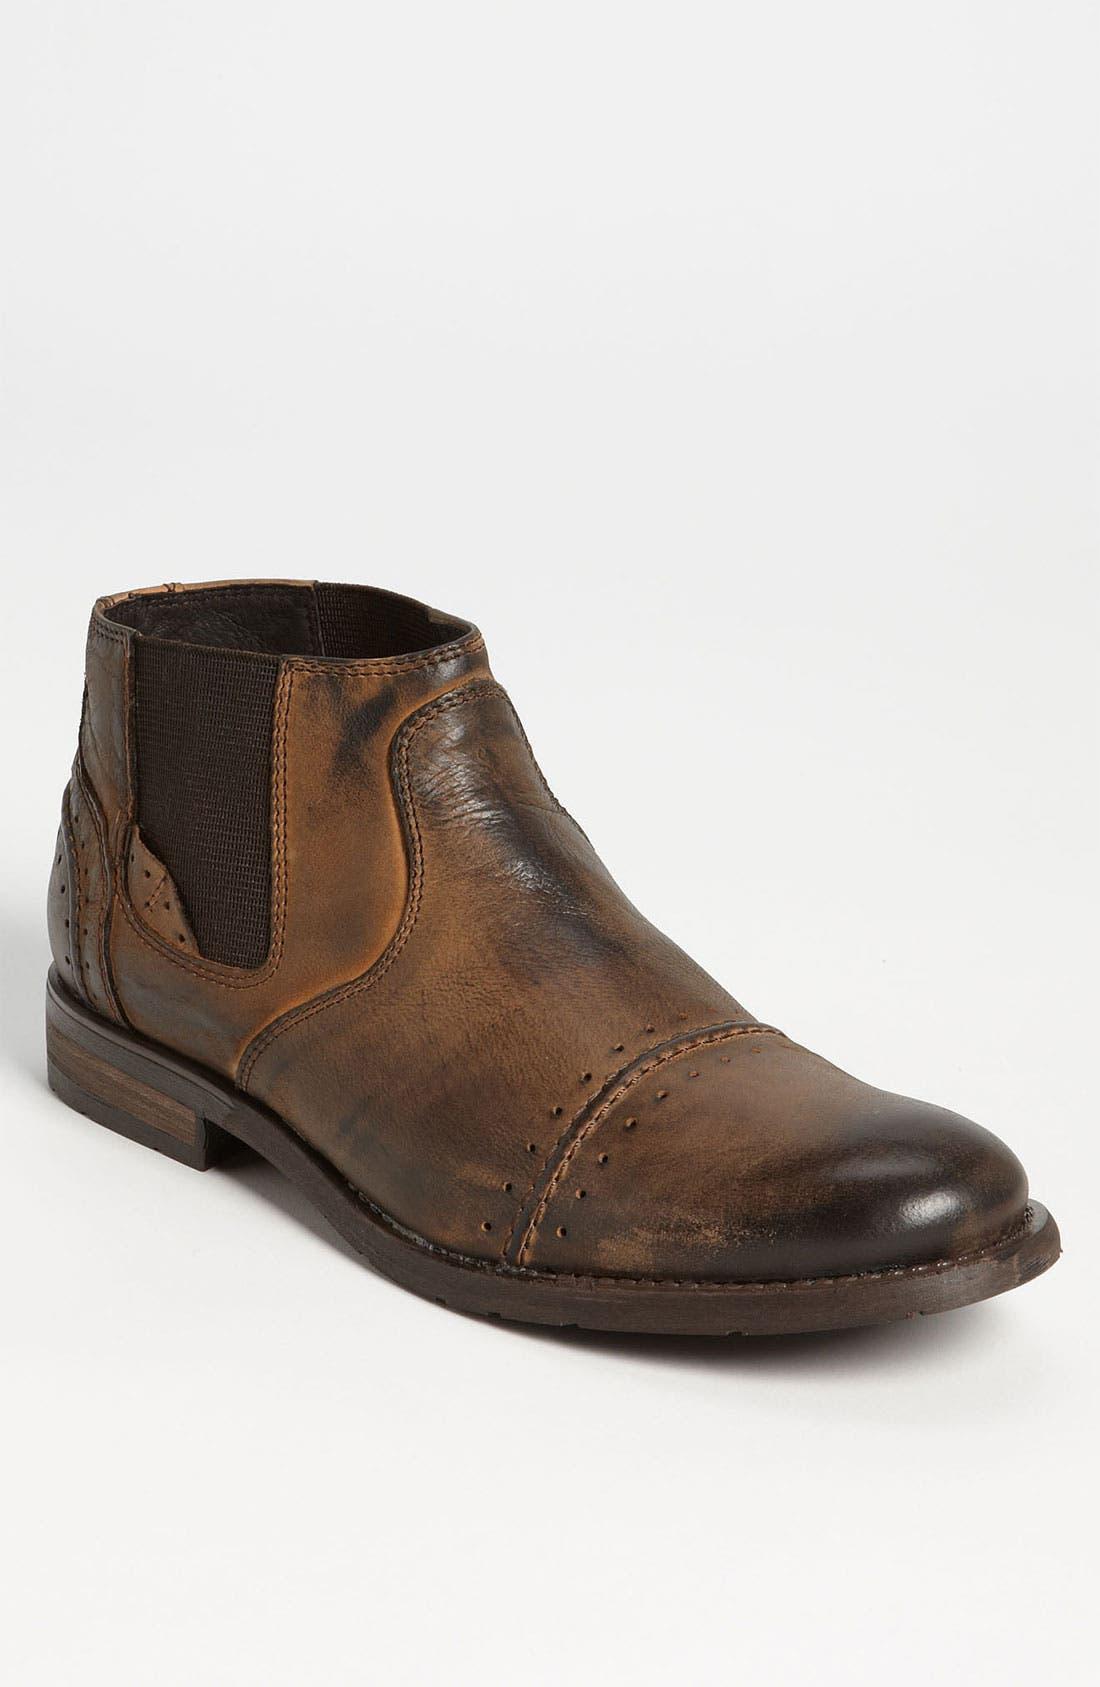 Alternate Image 1 Selected - Bacco Bucci 'Borelli' Chelsea Boot (Men)